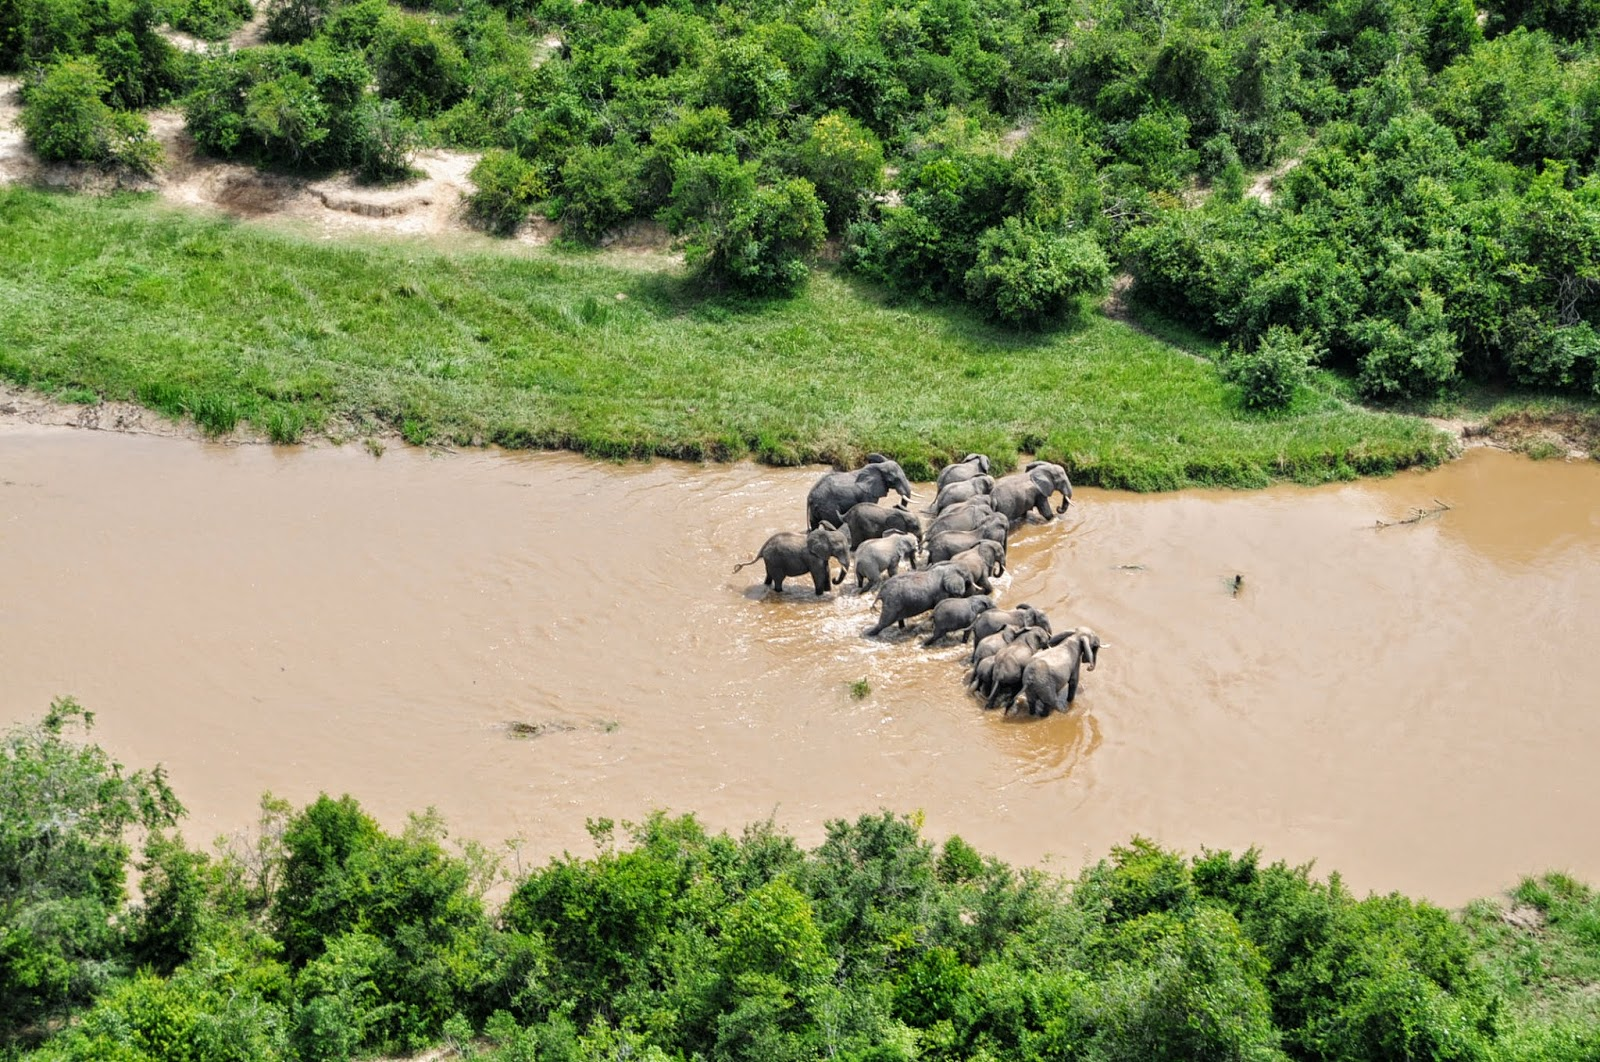 Les éléphants traversent la rivière Ishasha